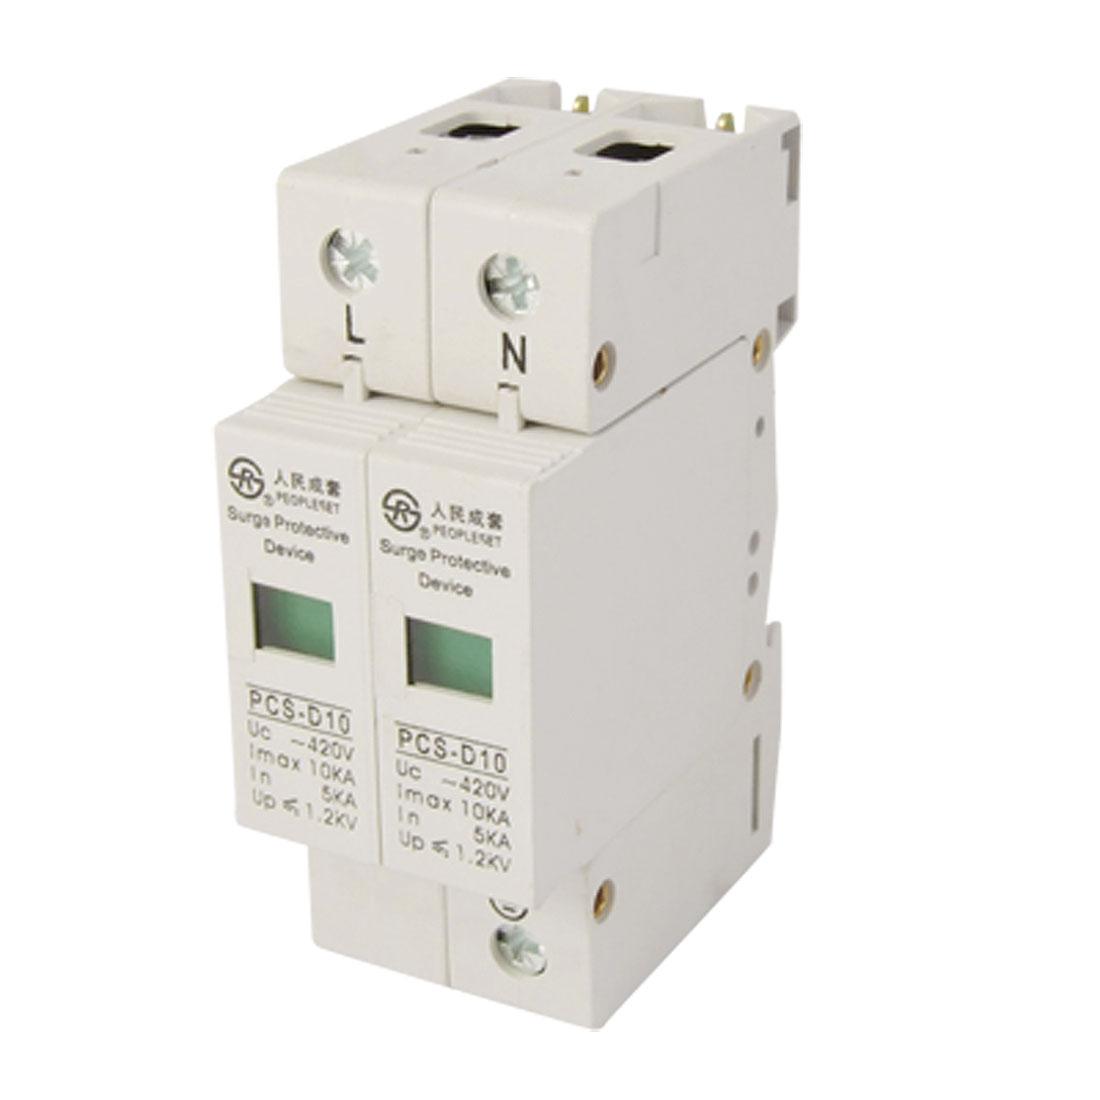 Photovoltaic 2 Pole 10KA 420VAC Surge Protection Device